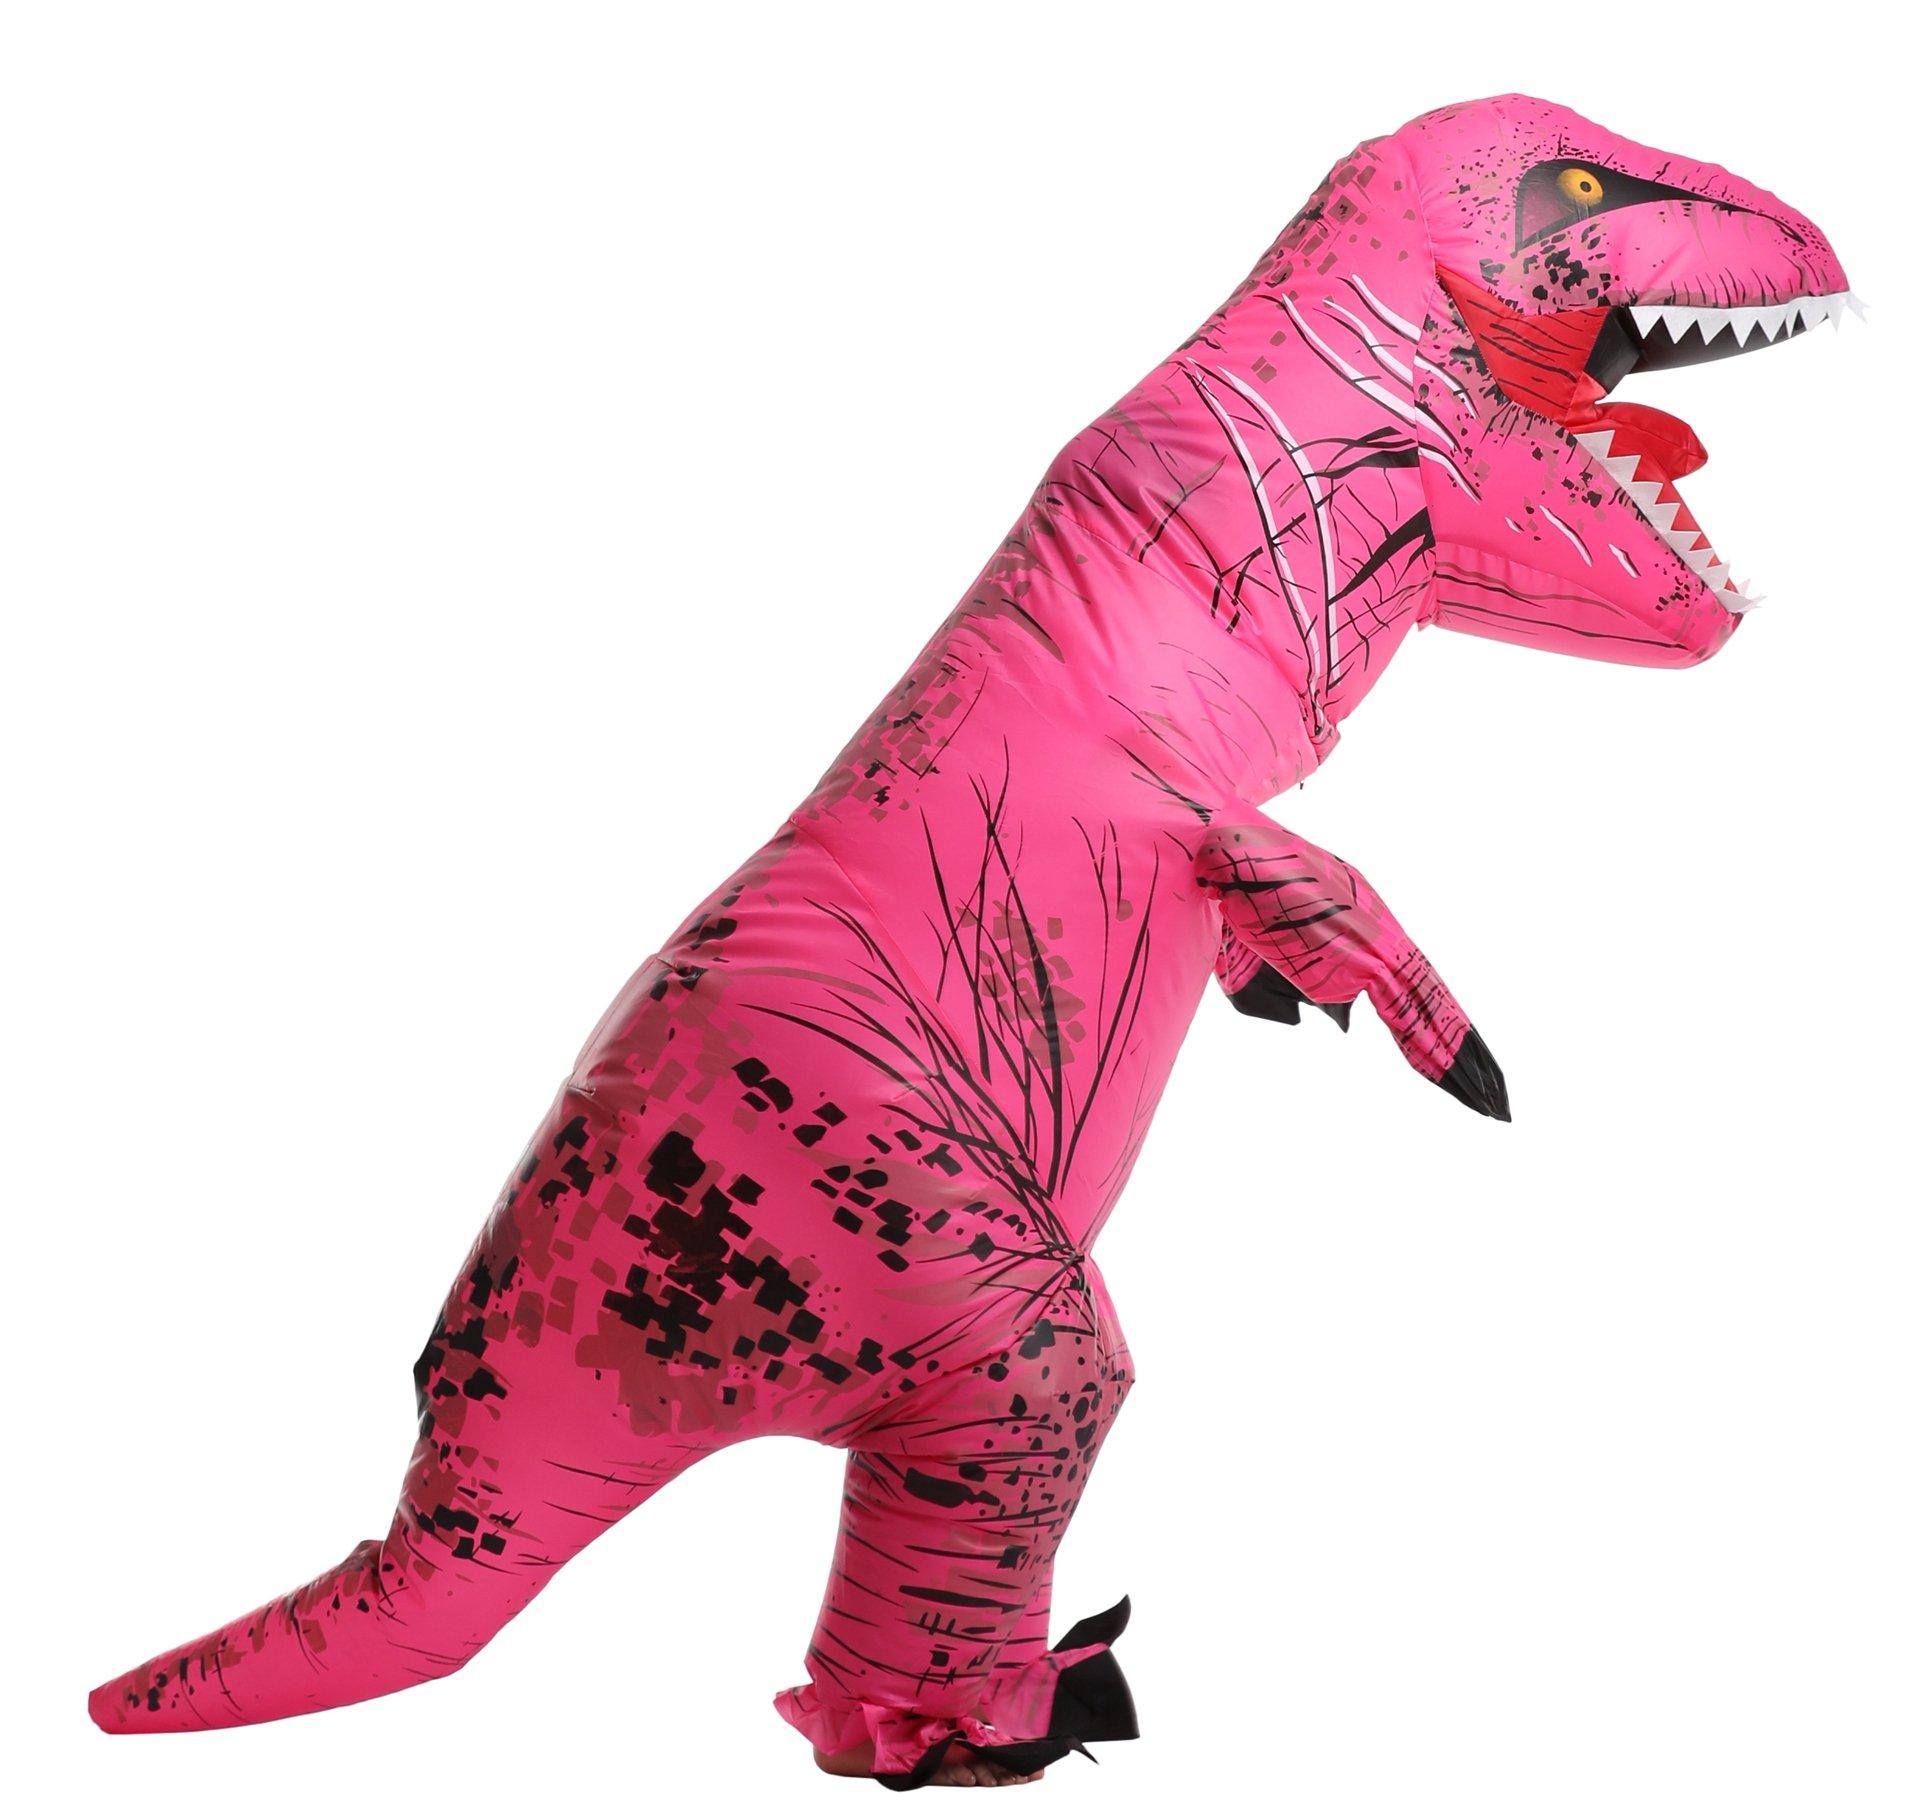 Unisex Kids Christmas Costume Jurassic T-Rex Inflatable Costume, child, Rose